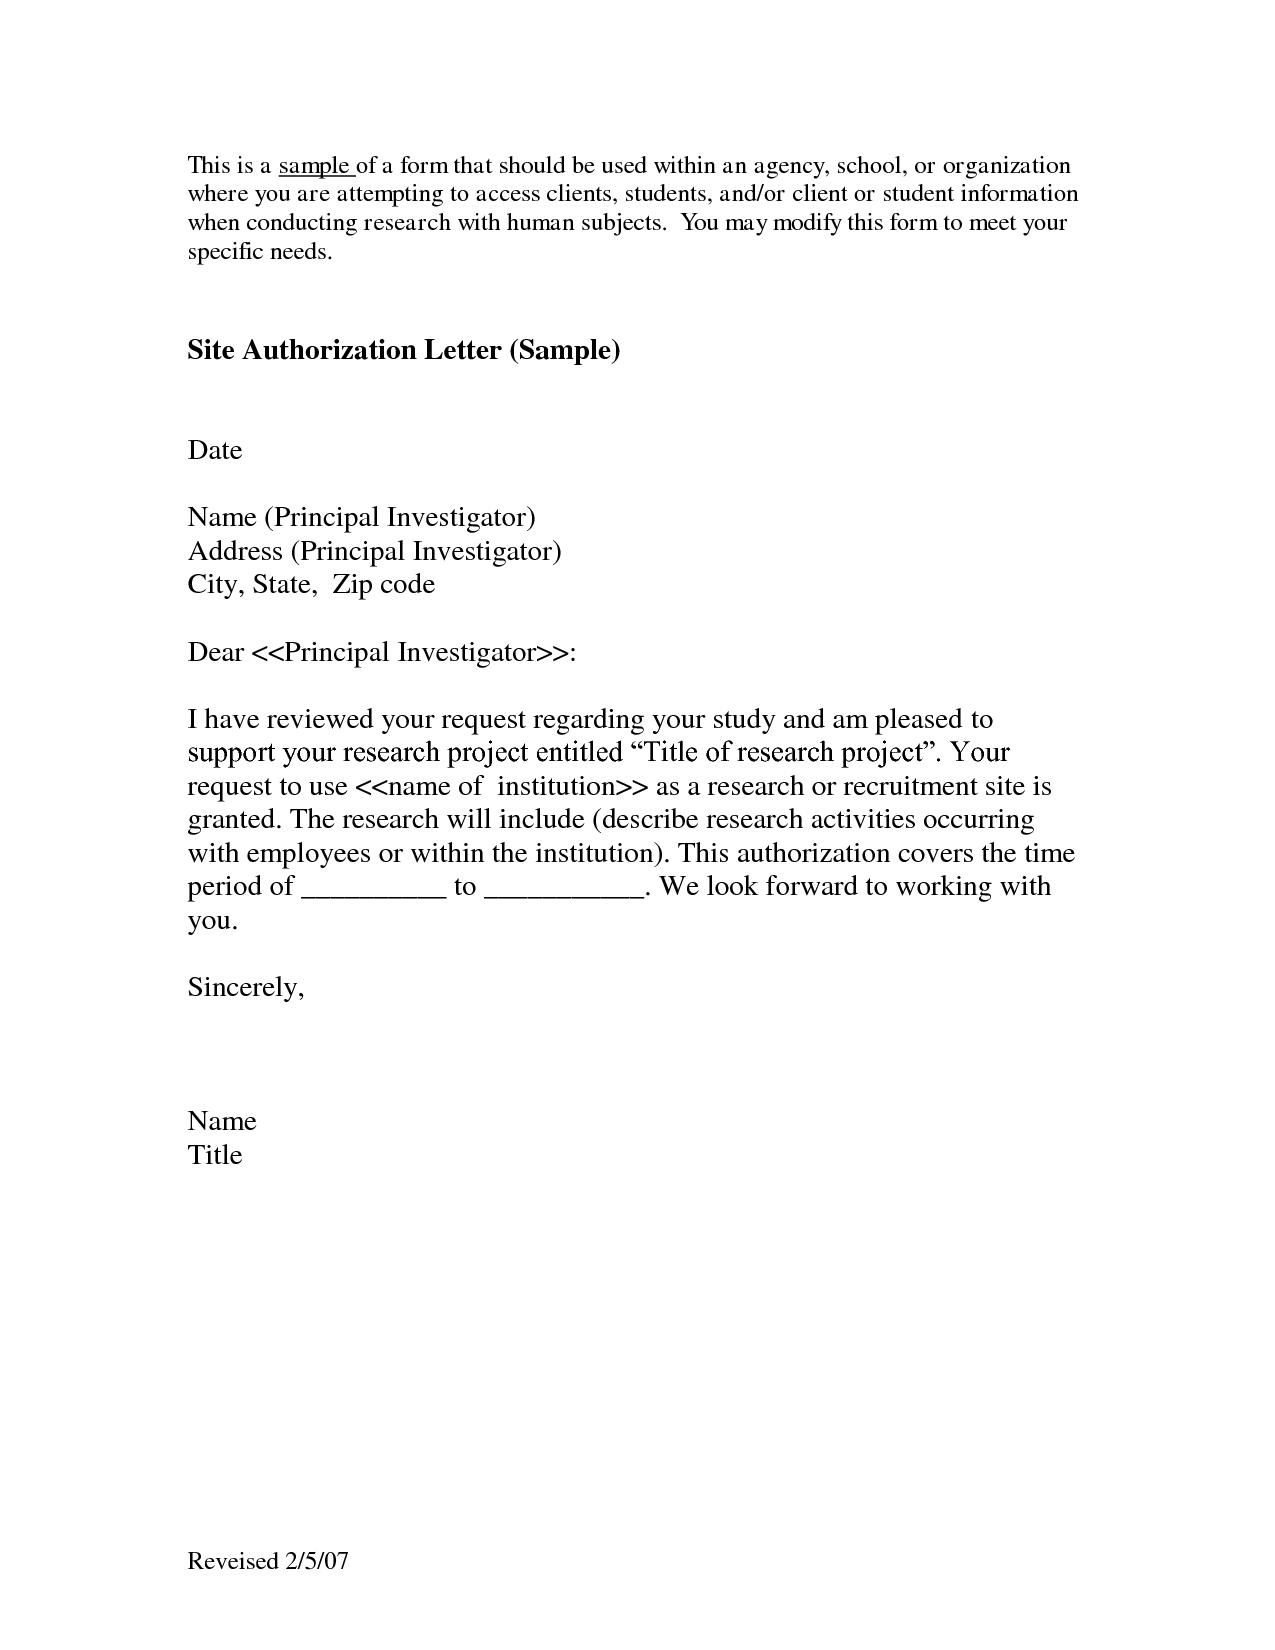 Parental Consent Permission Letter Template - Tender Authorization Letter Authorization Letter to Purchase